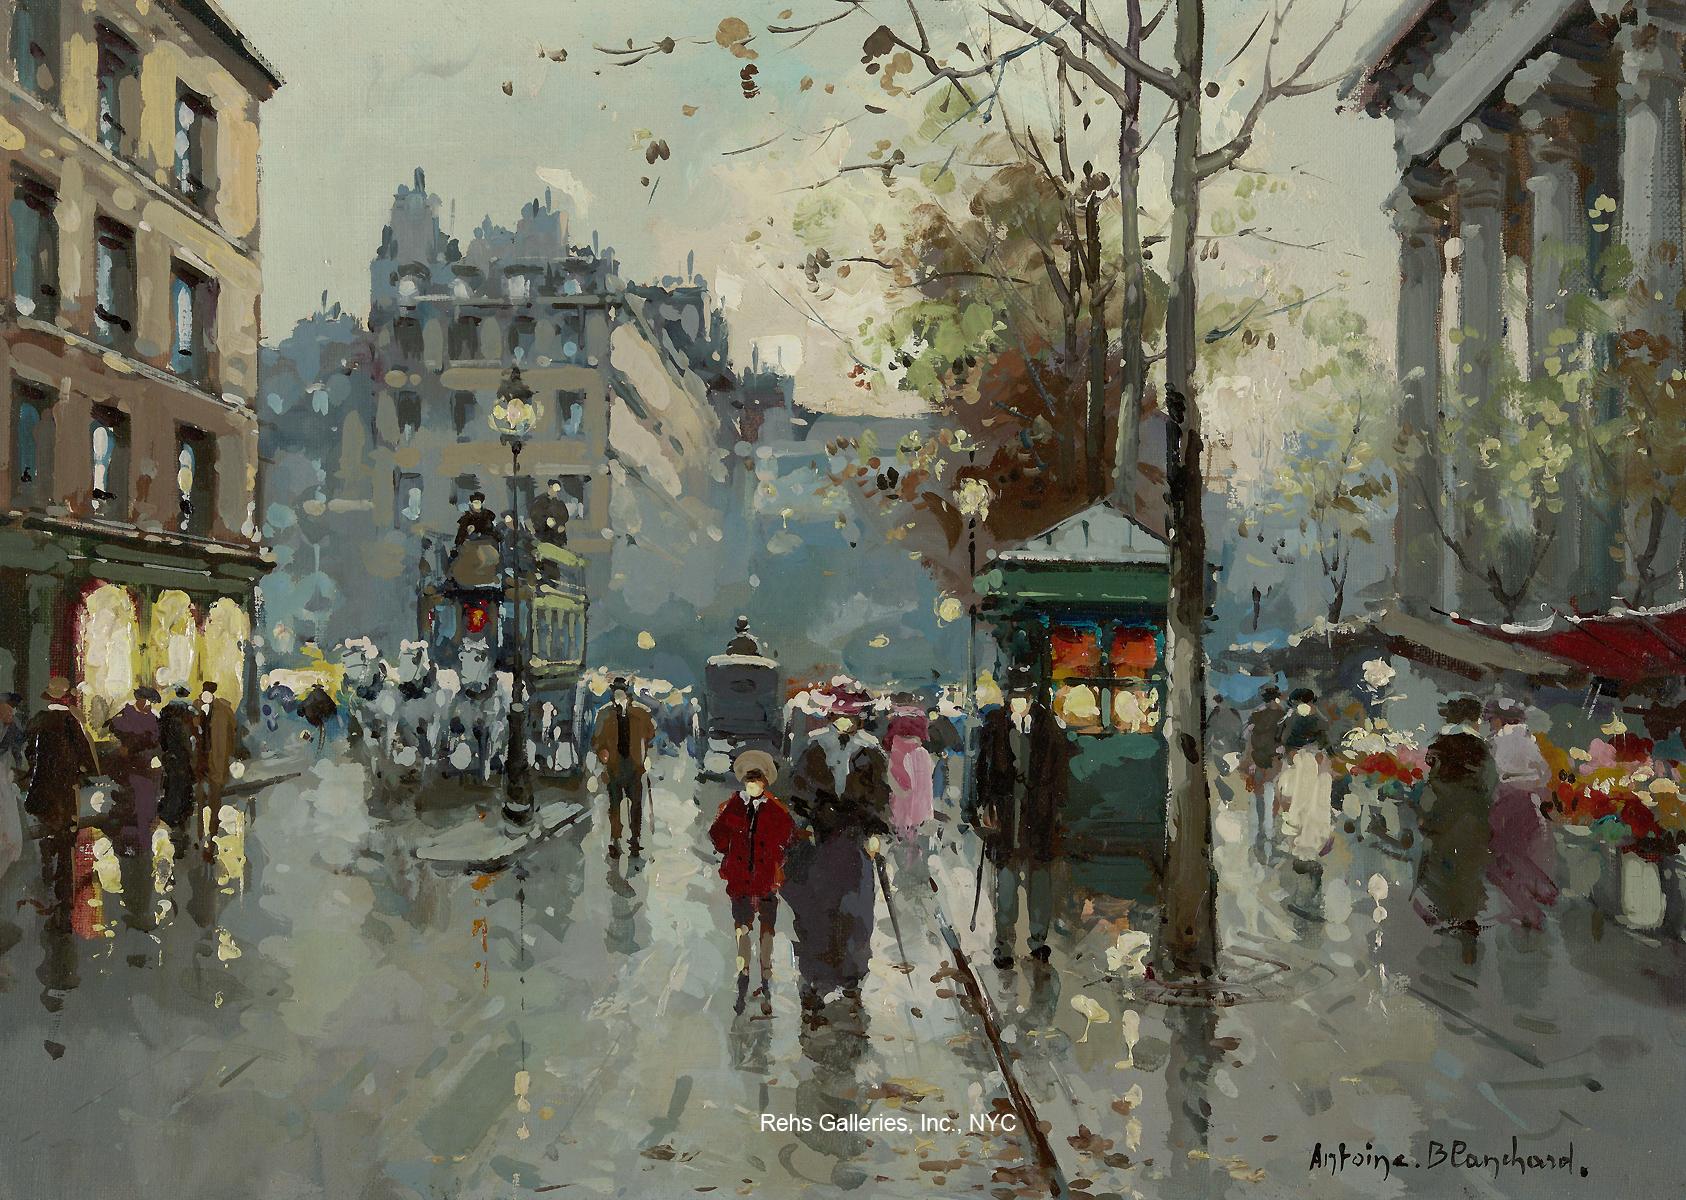 antoine_blanchard_e1249_place_de_la_madeleine_wm.jpg